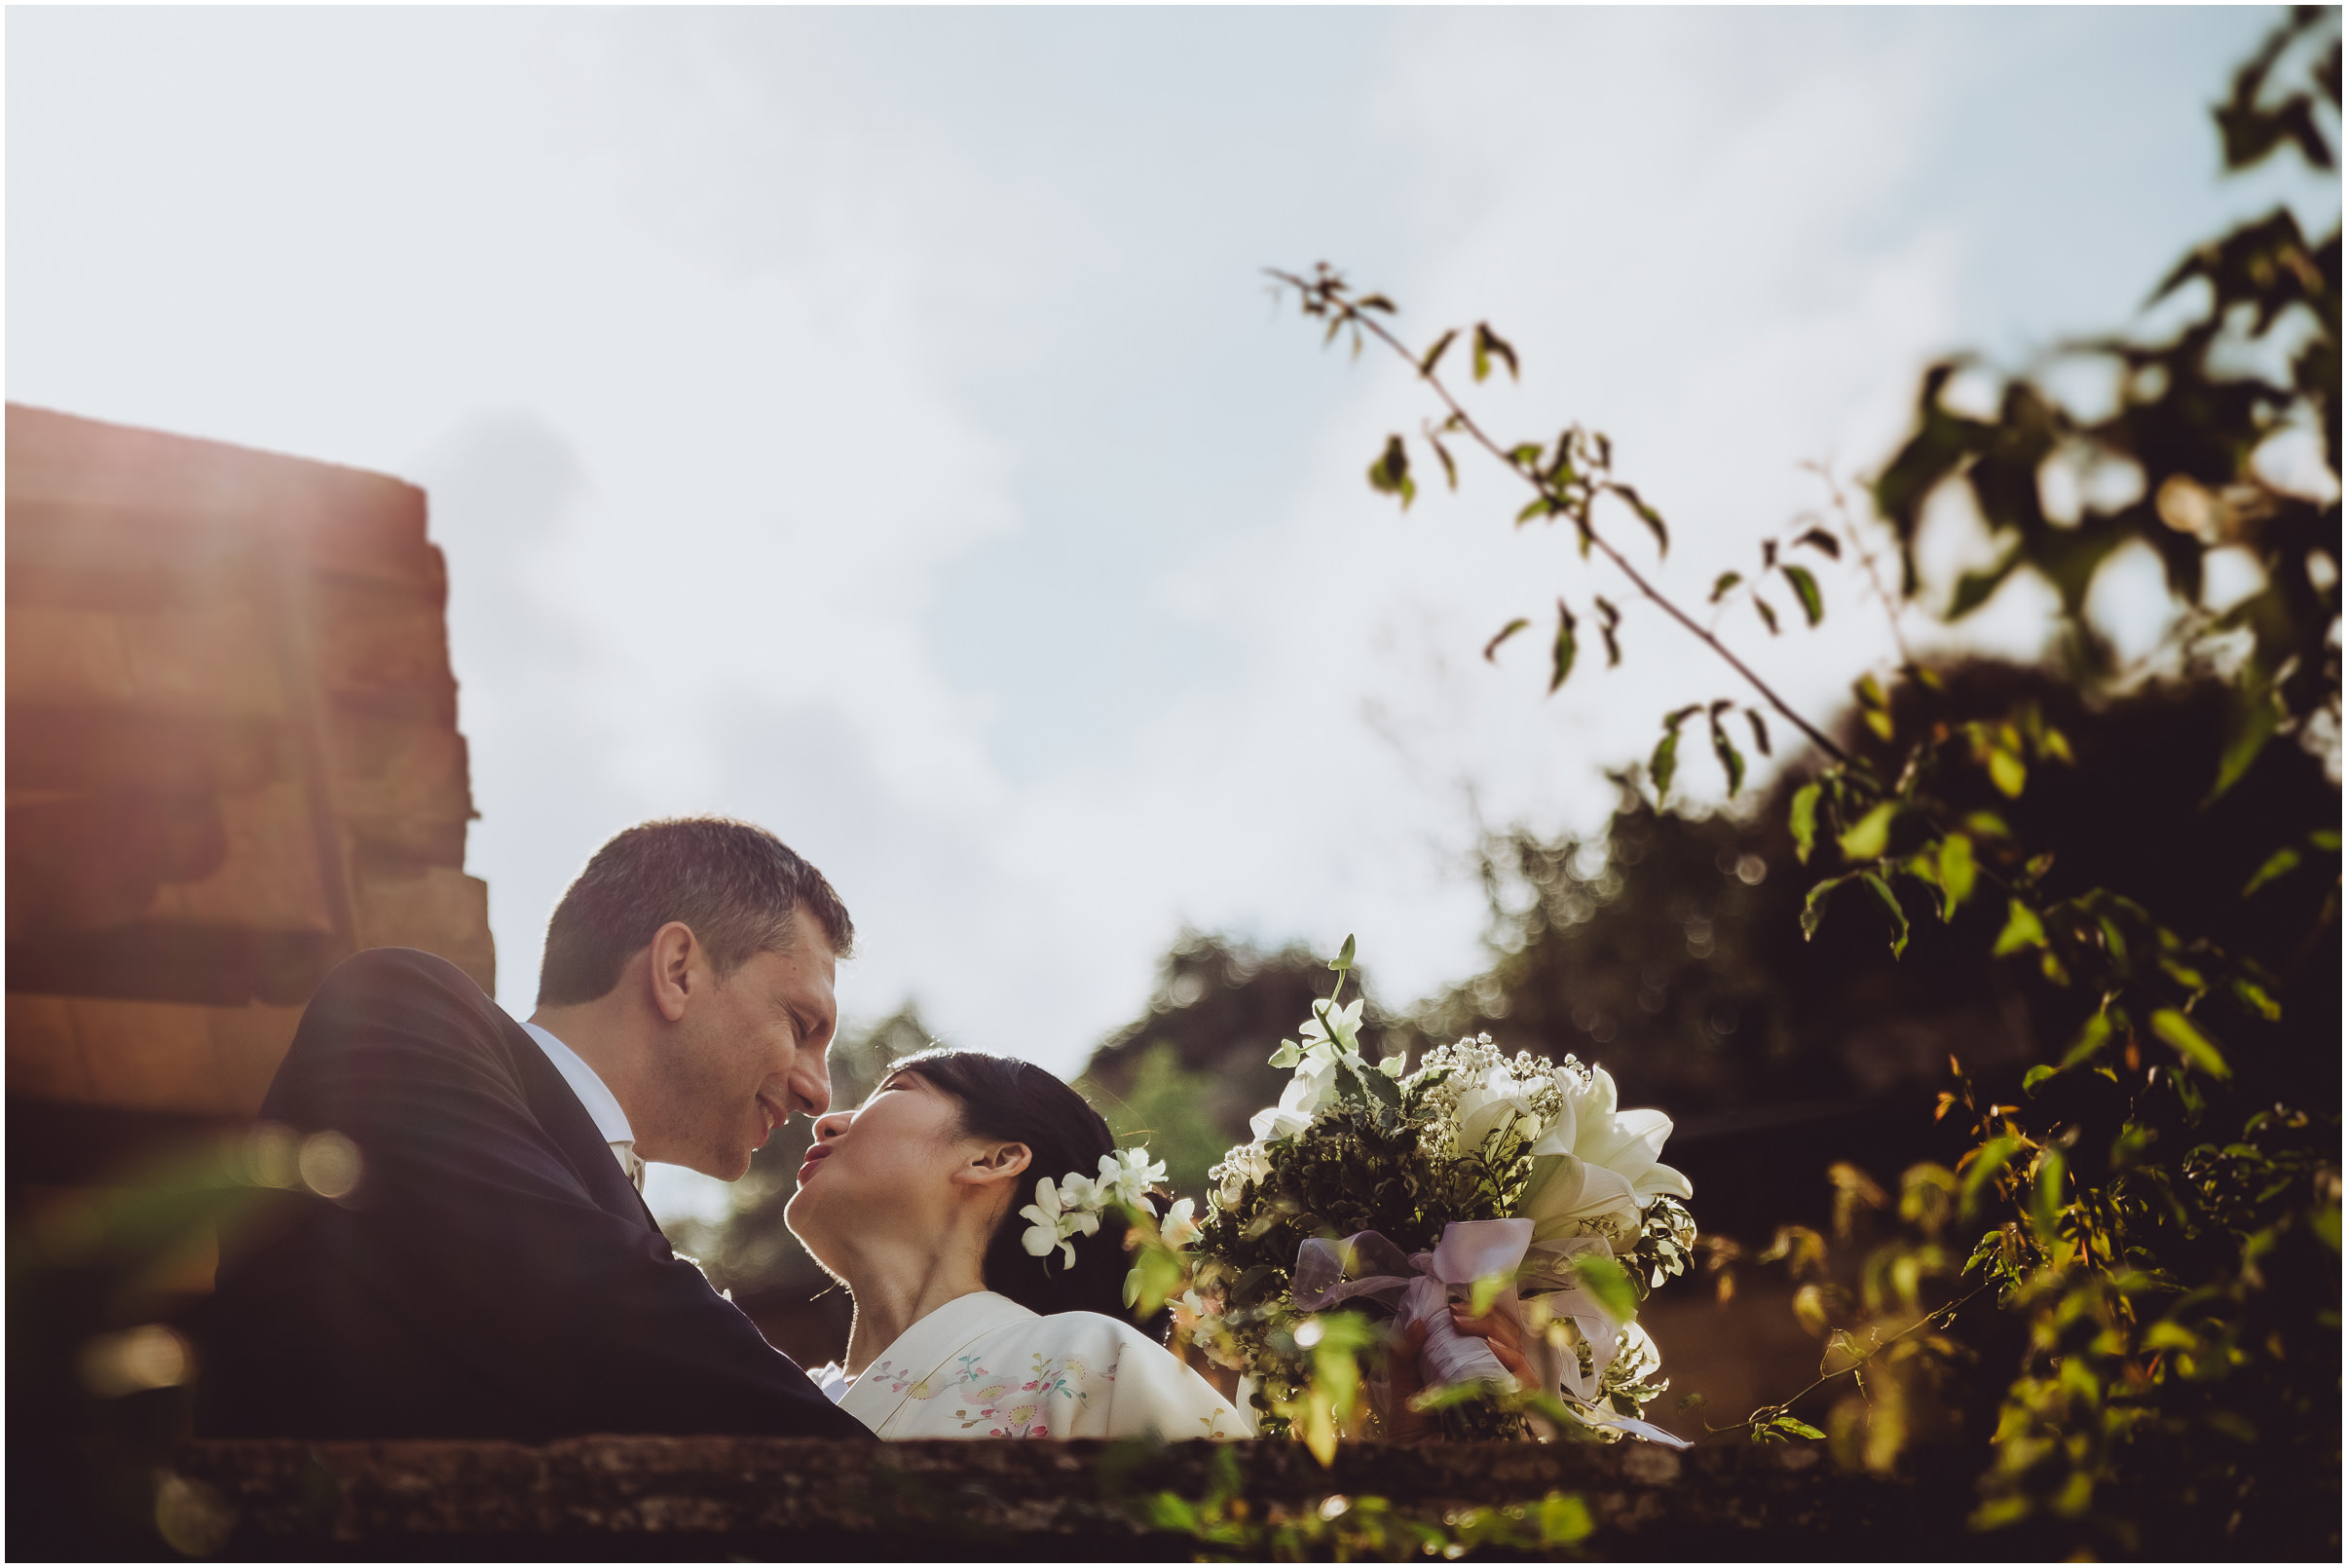 WEDDING-PHOTOGRAPHY-SARA-LORENZONI-FOTOGRAFIA-MATRIMONIO-ORVIETO-JUKA-ANTONELLO37